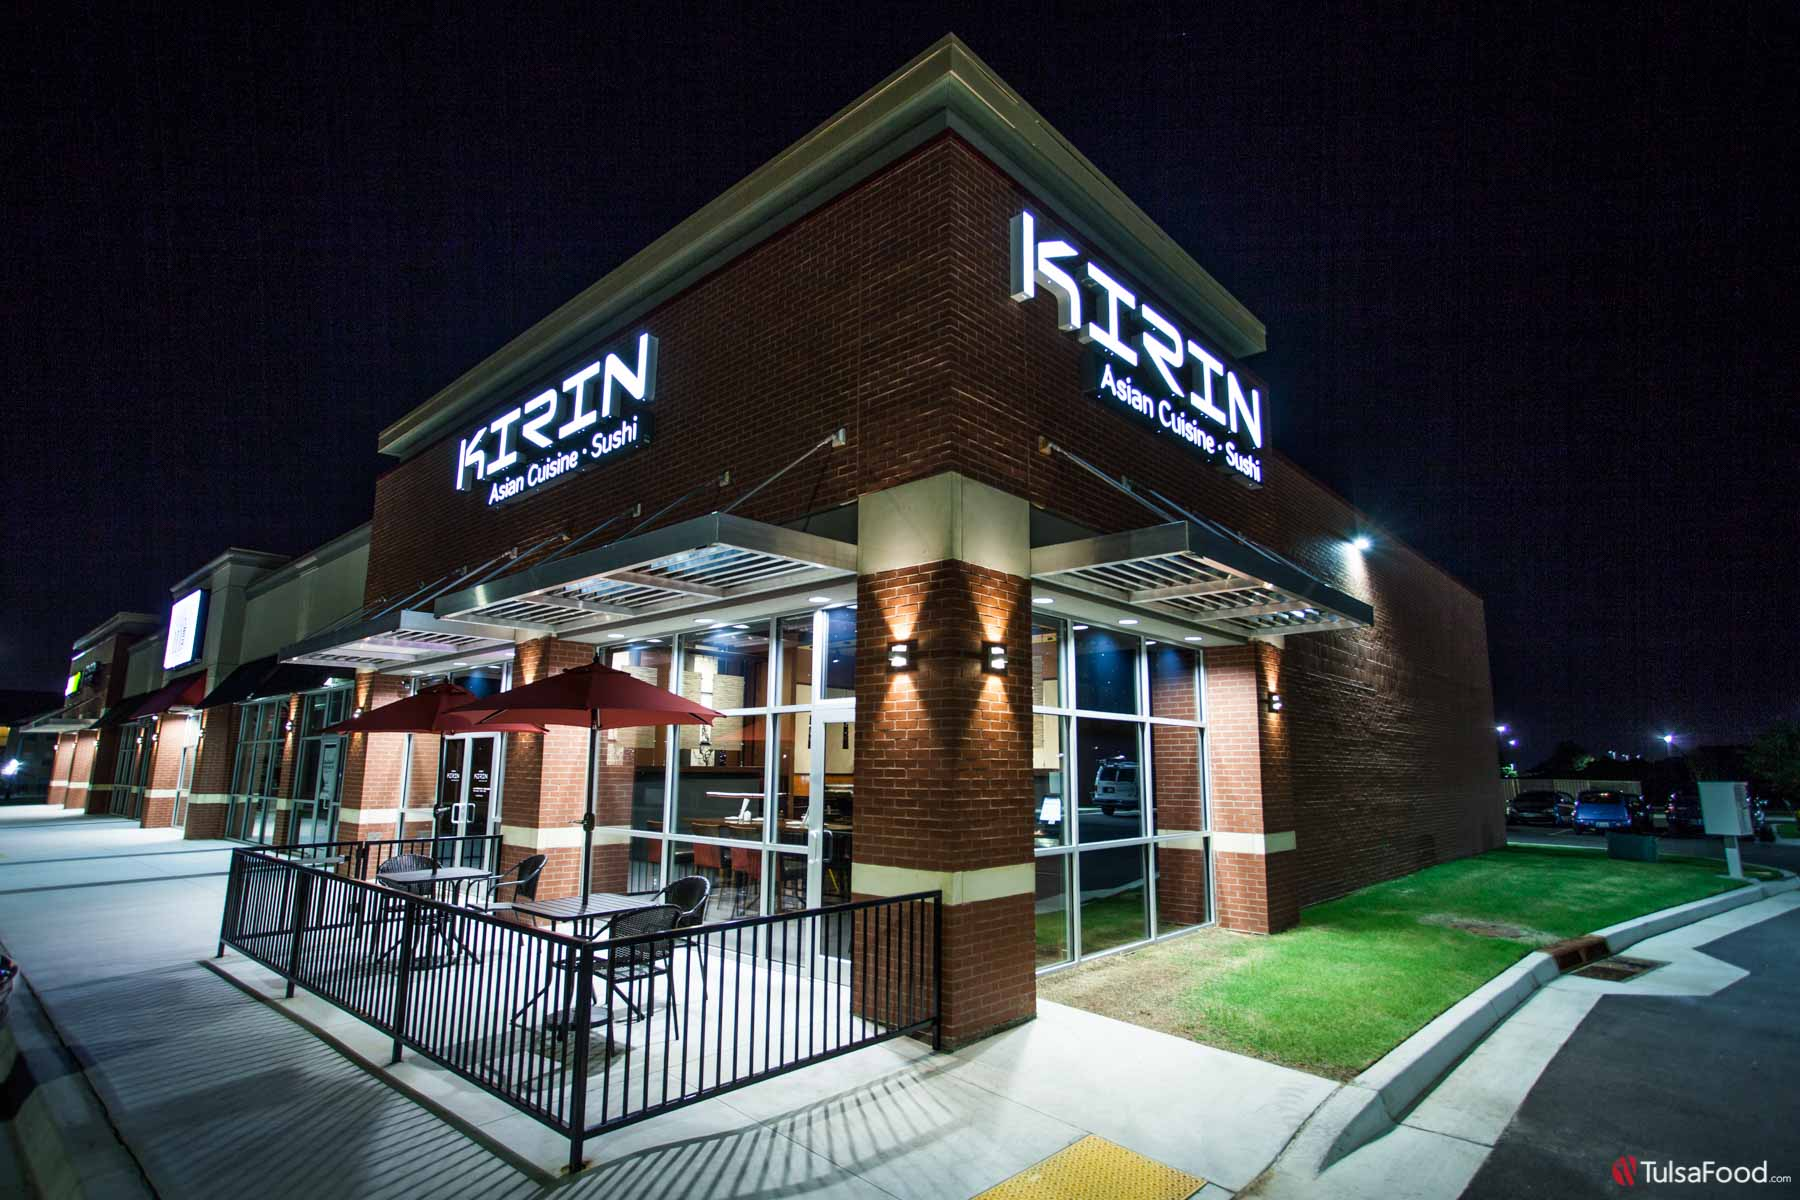 Tulsa and asian restaurants